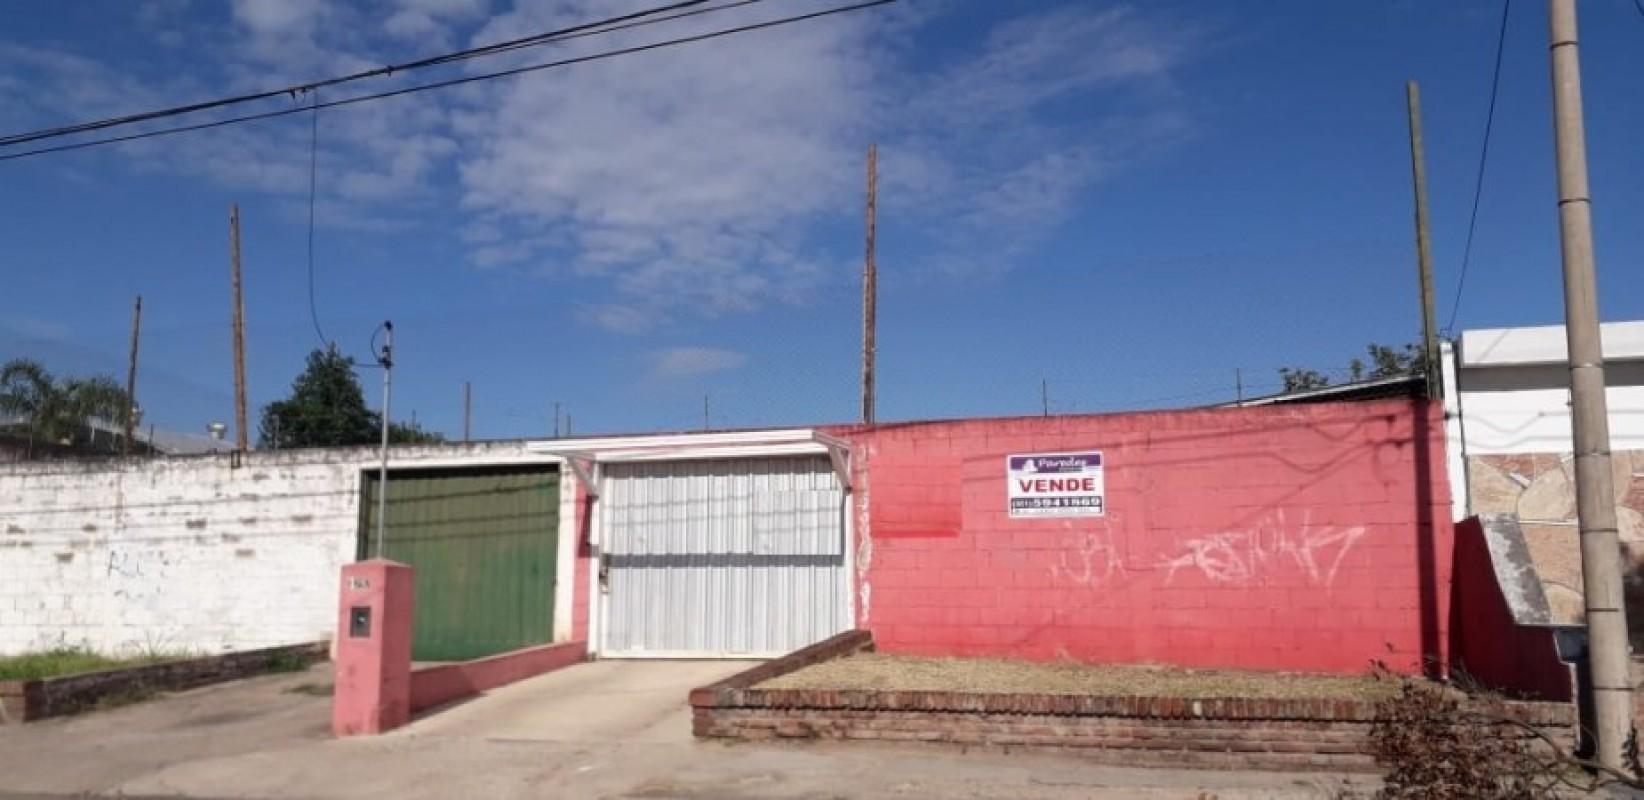 Lote en venta barrio Rosedal 300m2 a metros de Ruta 20